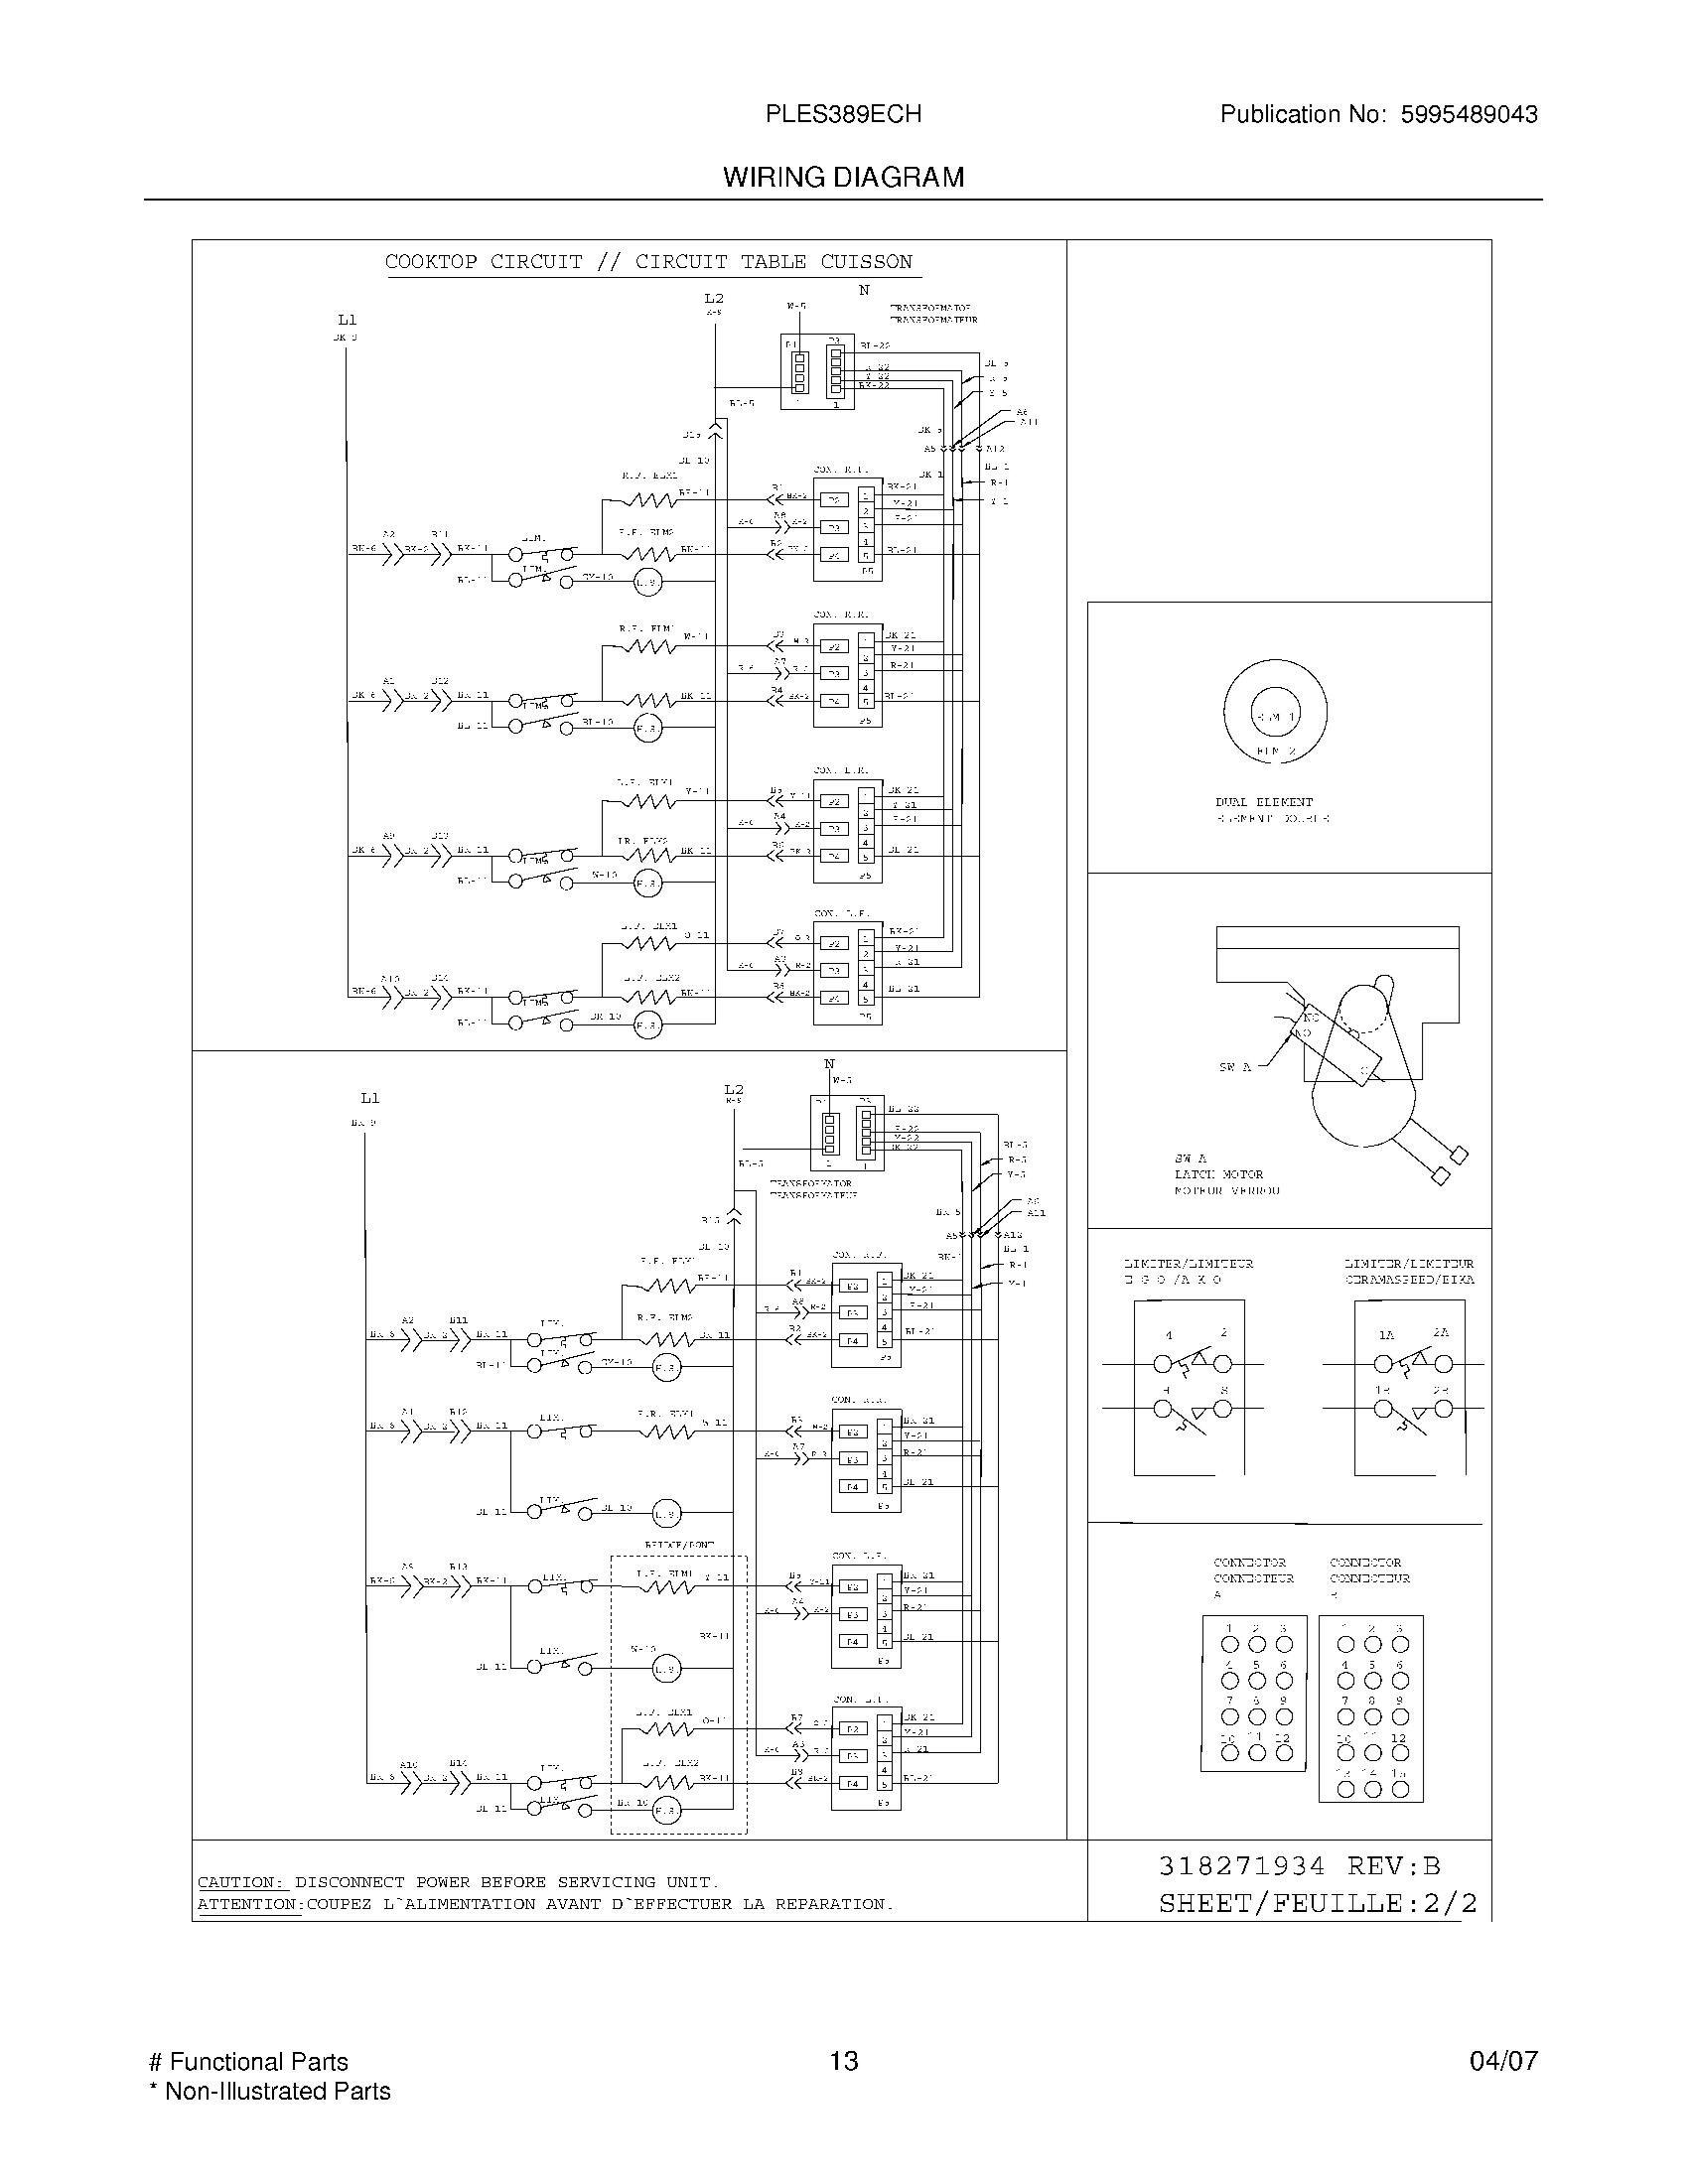 ElectroluxImg_19000101 20150717_00146085?width\=206 cooktop wiring diagram switch 3 way switch diagram, network network switch wiring diagram at n-0.co